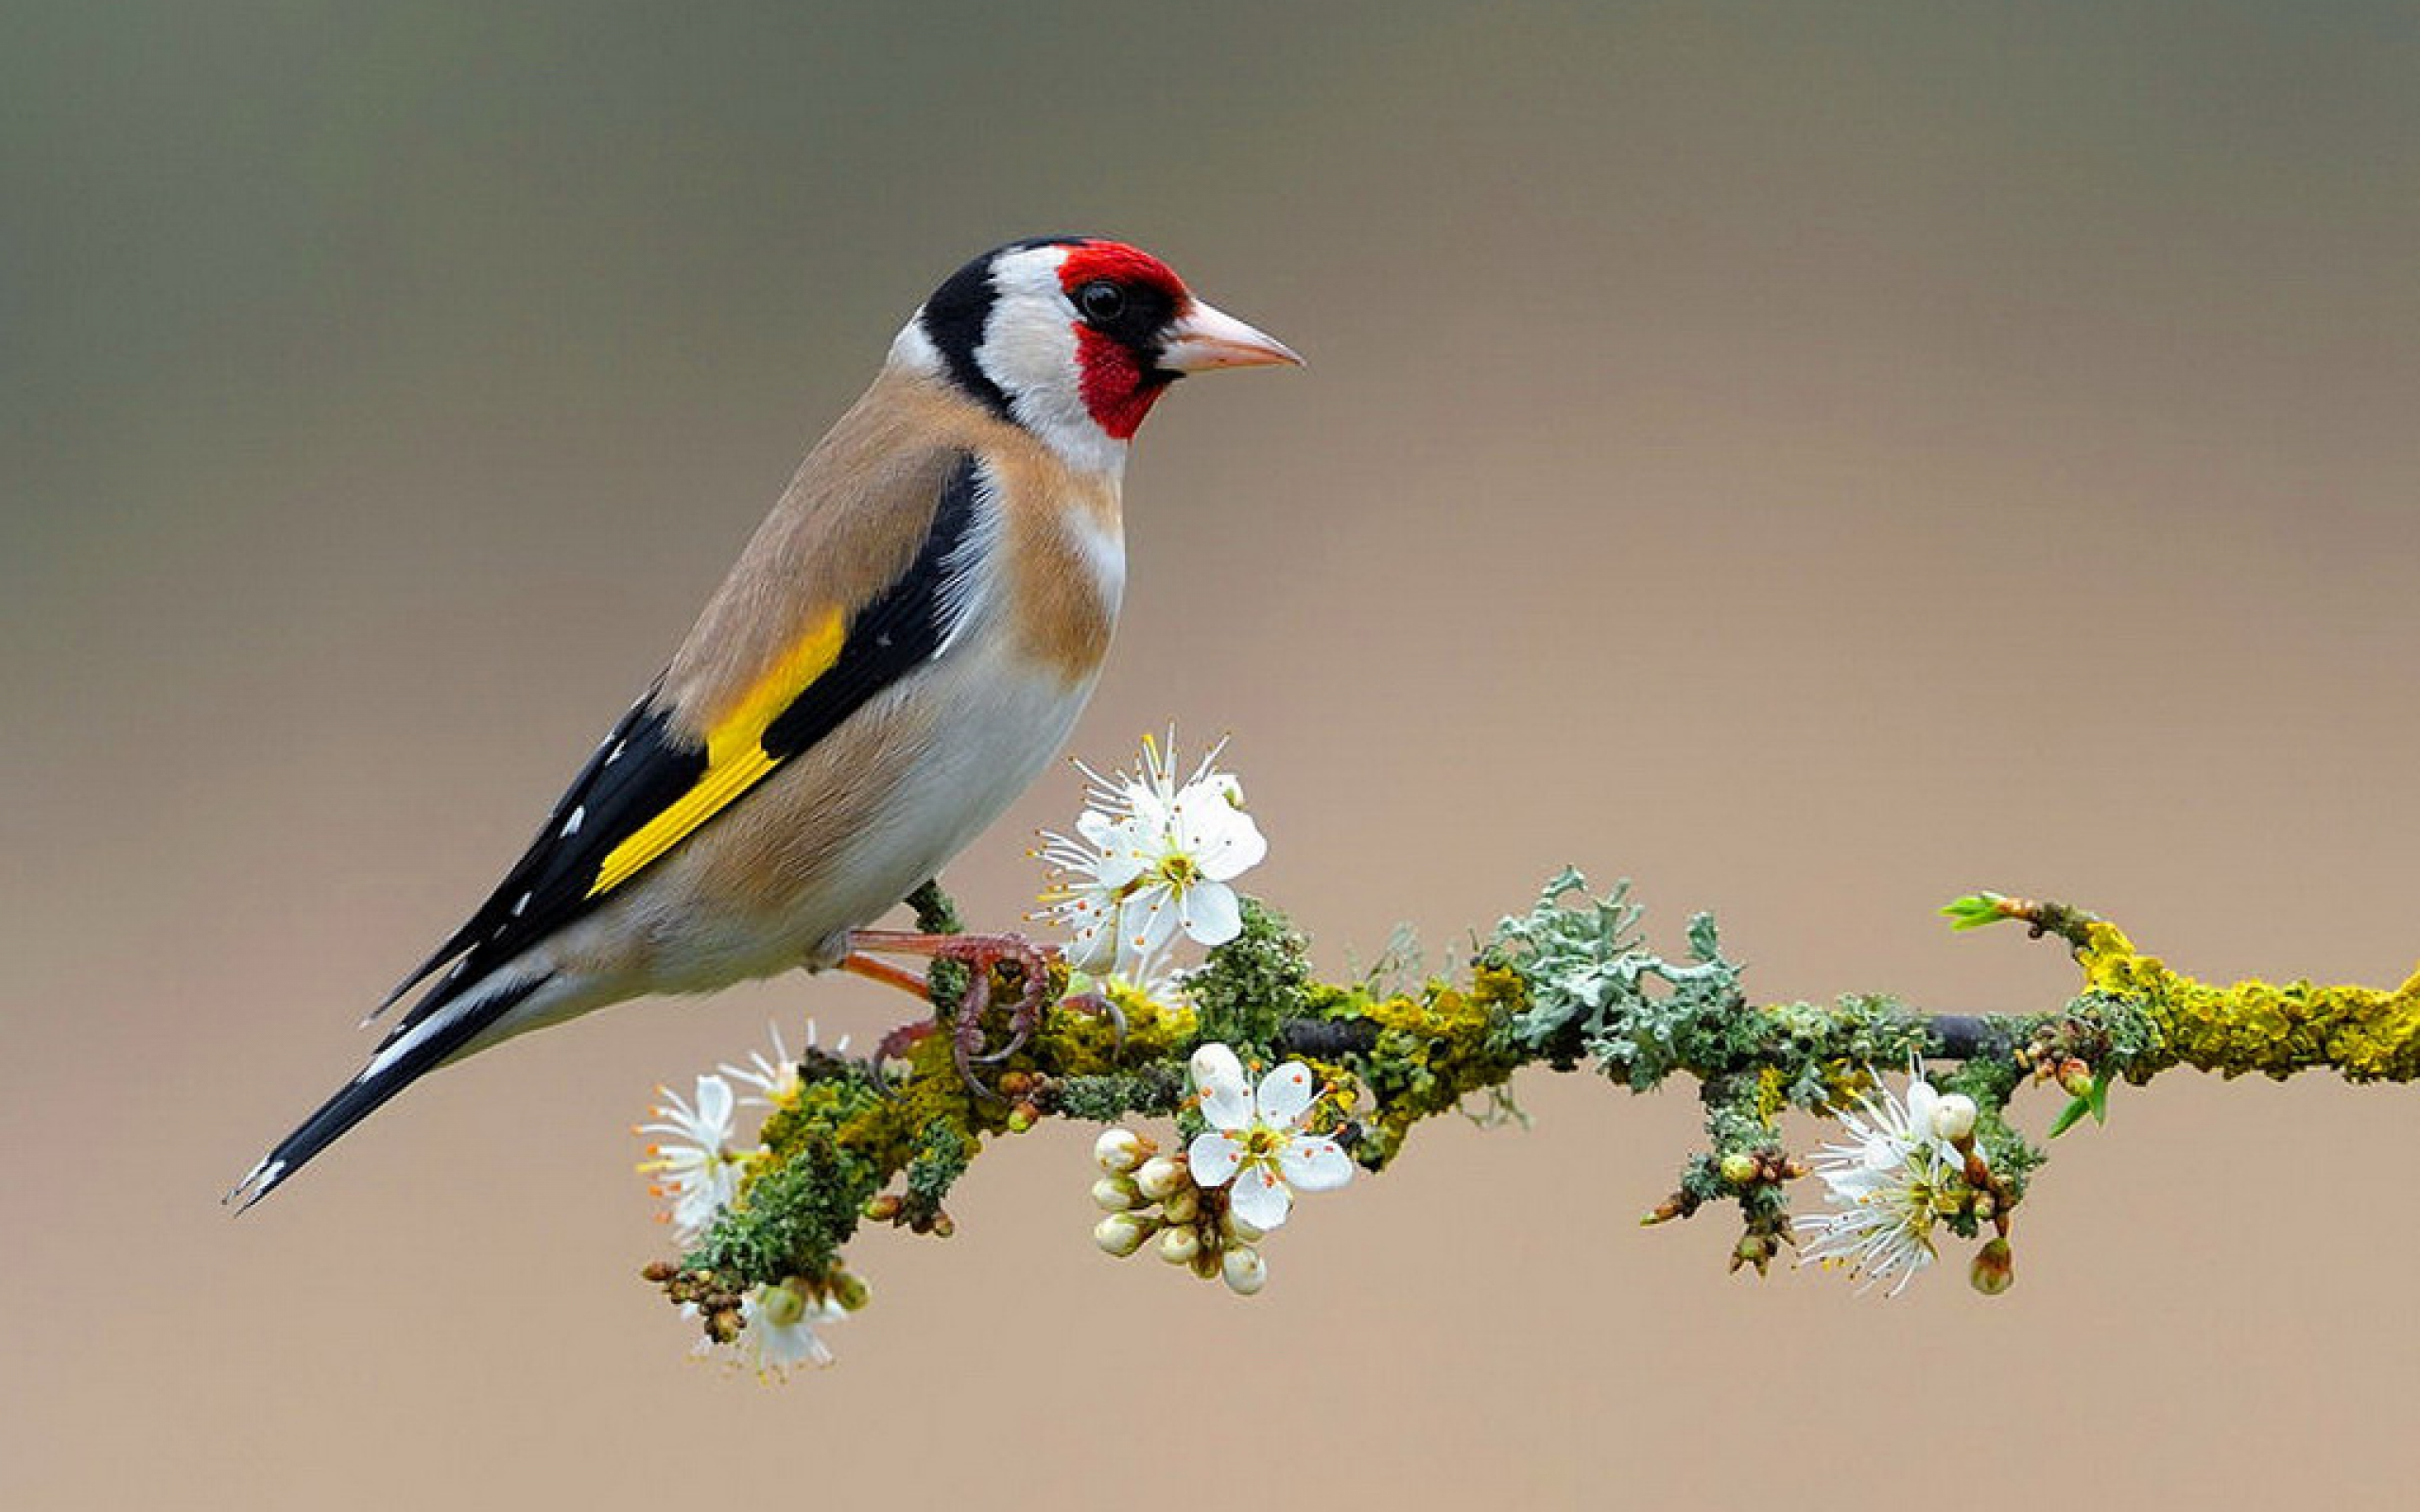 Bird On Flower Branch 2560x1600 6606 HD Wallpaper Res 2560x1600 2560x1600